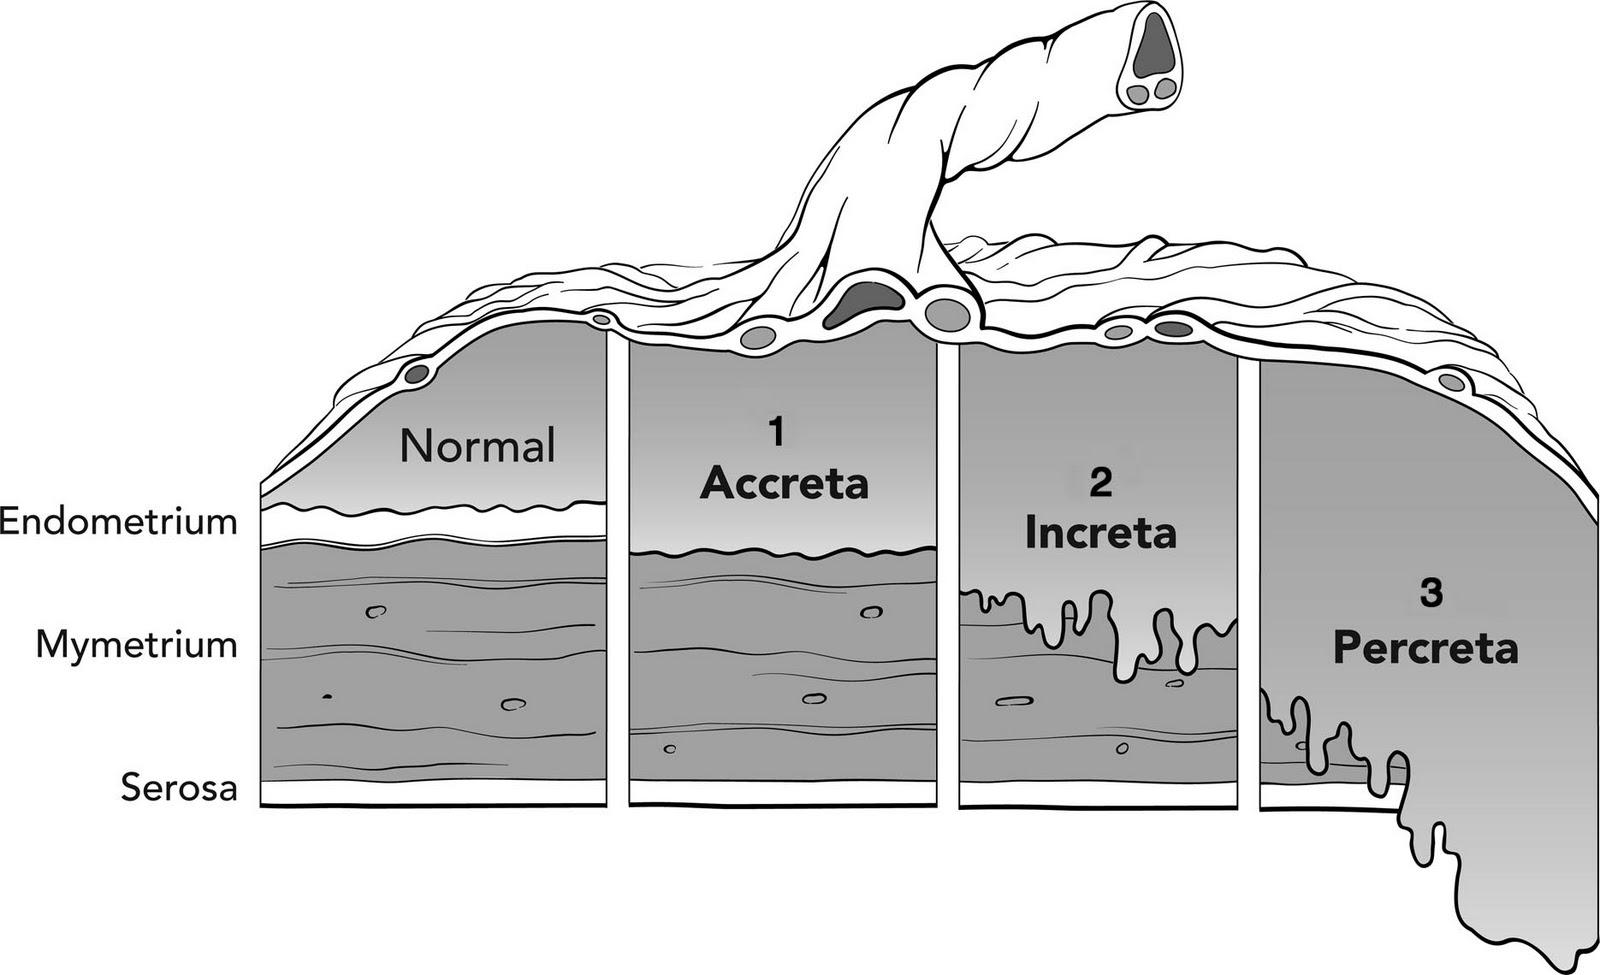 Anesthesia resident placenta accreta facts placenta accreta facts pooptronica Choice Image